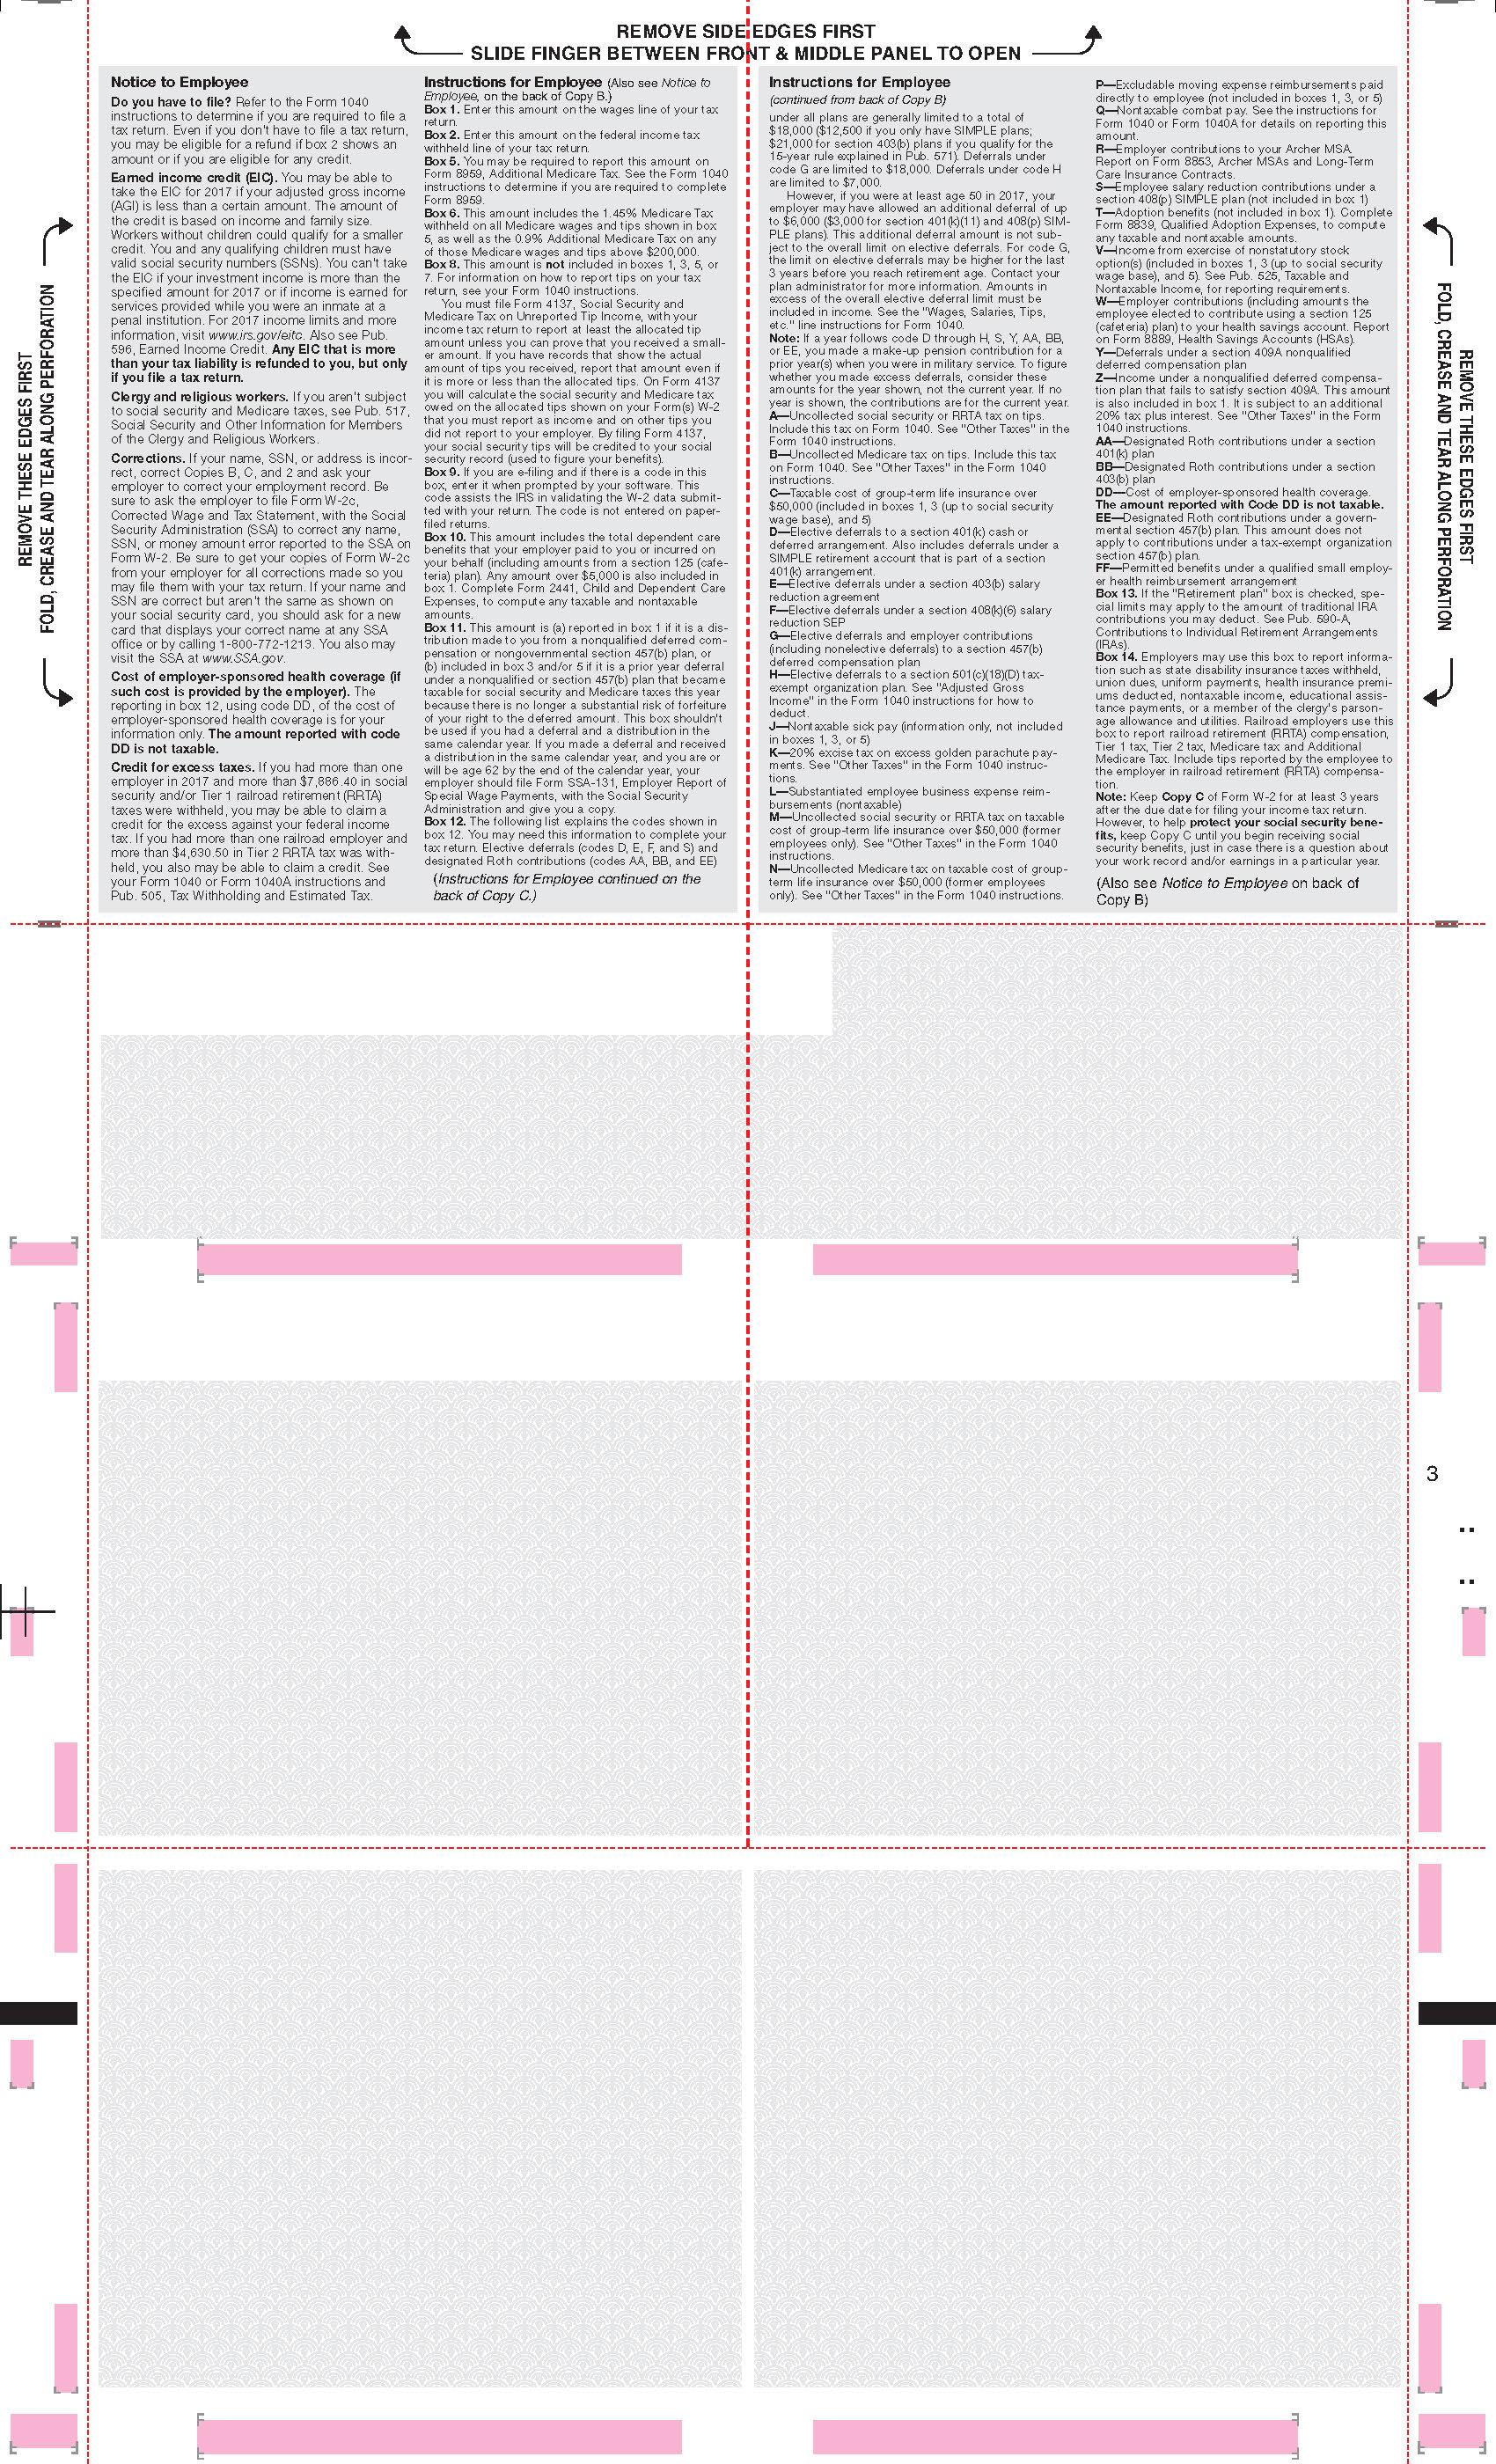 W 2 Blank Face Ez Fold Instructions On Back 4 Corner